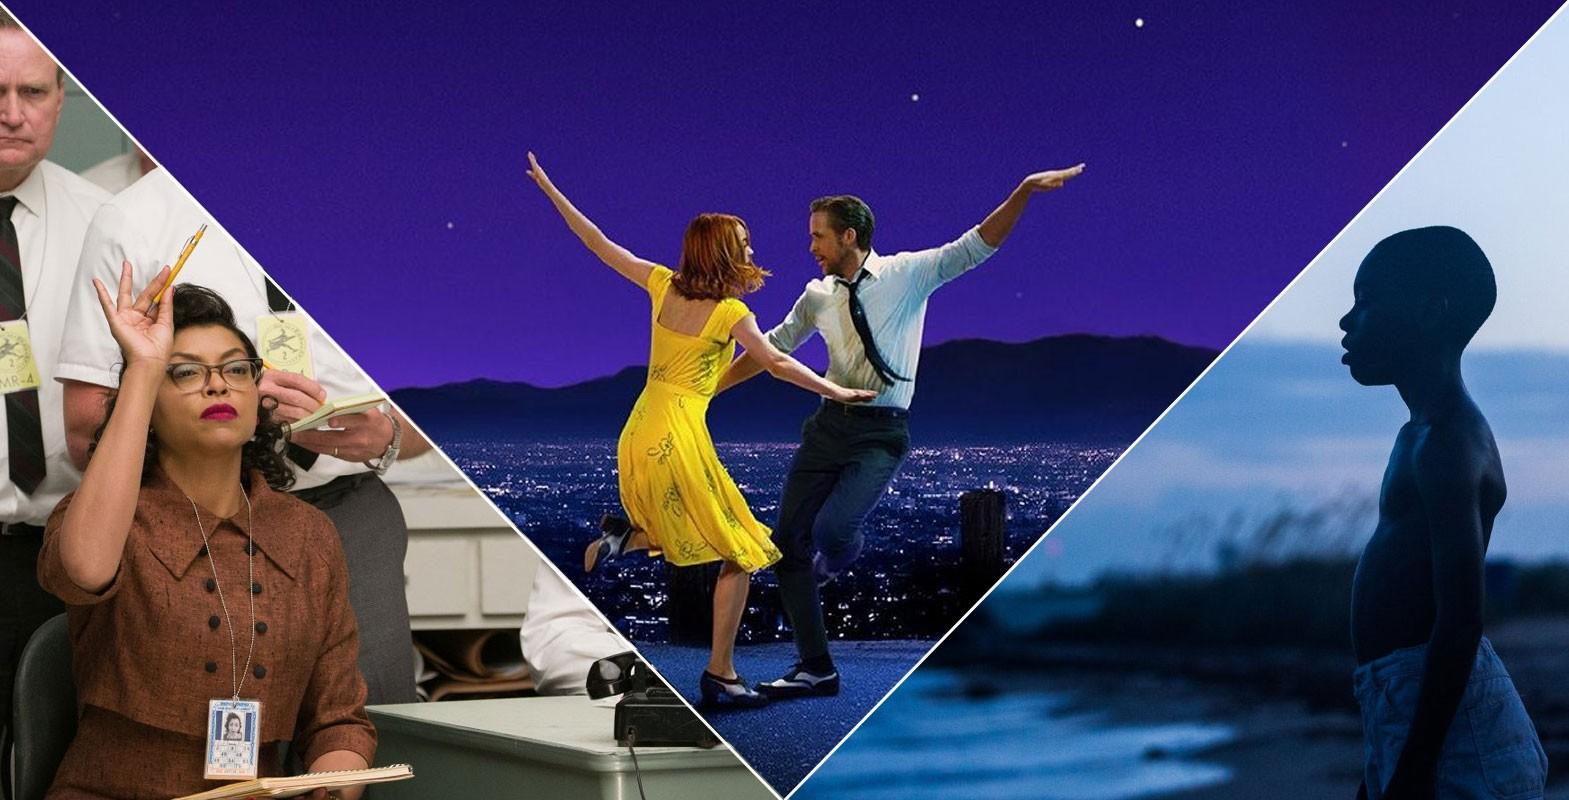 Oscar 2017: 'La la land' é favorito após prêmios, mas 'Estrelas além do tempo' pode surpreender